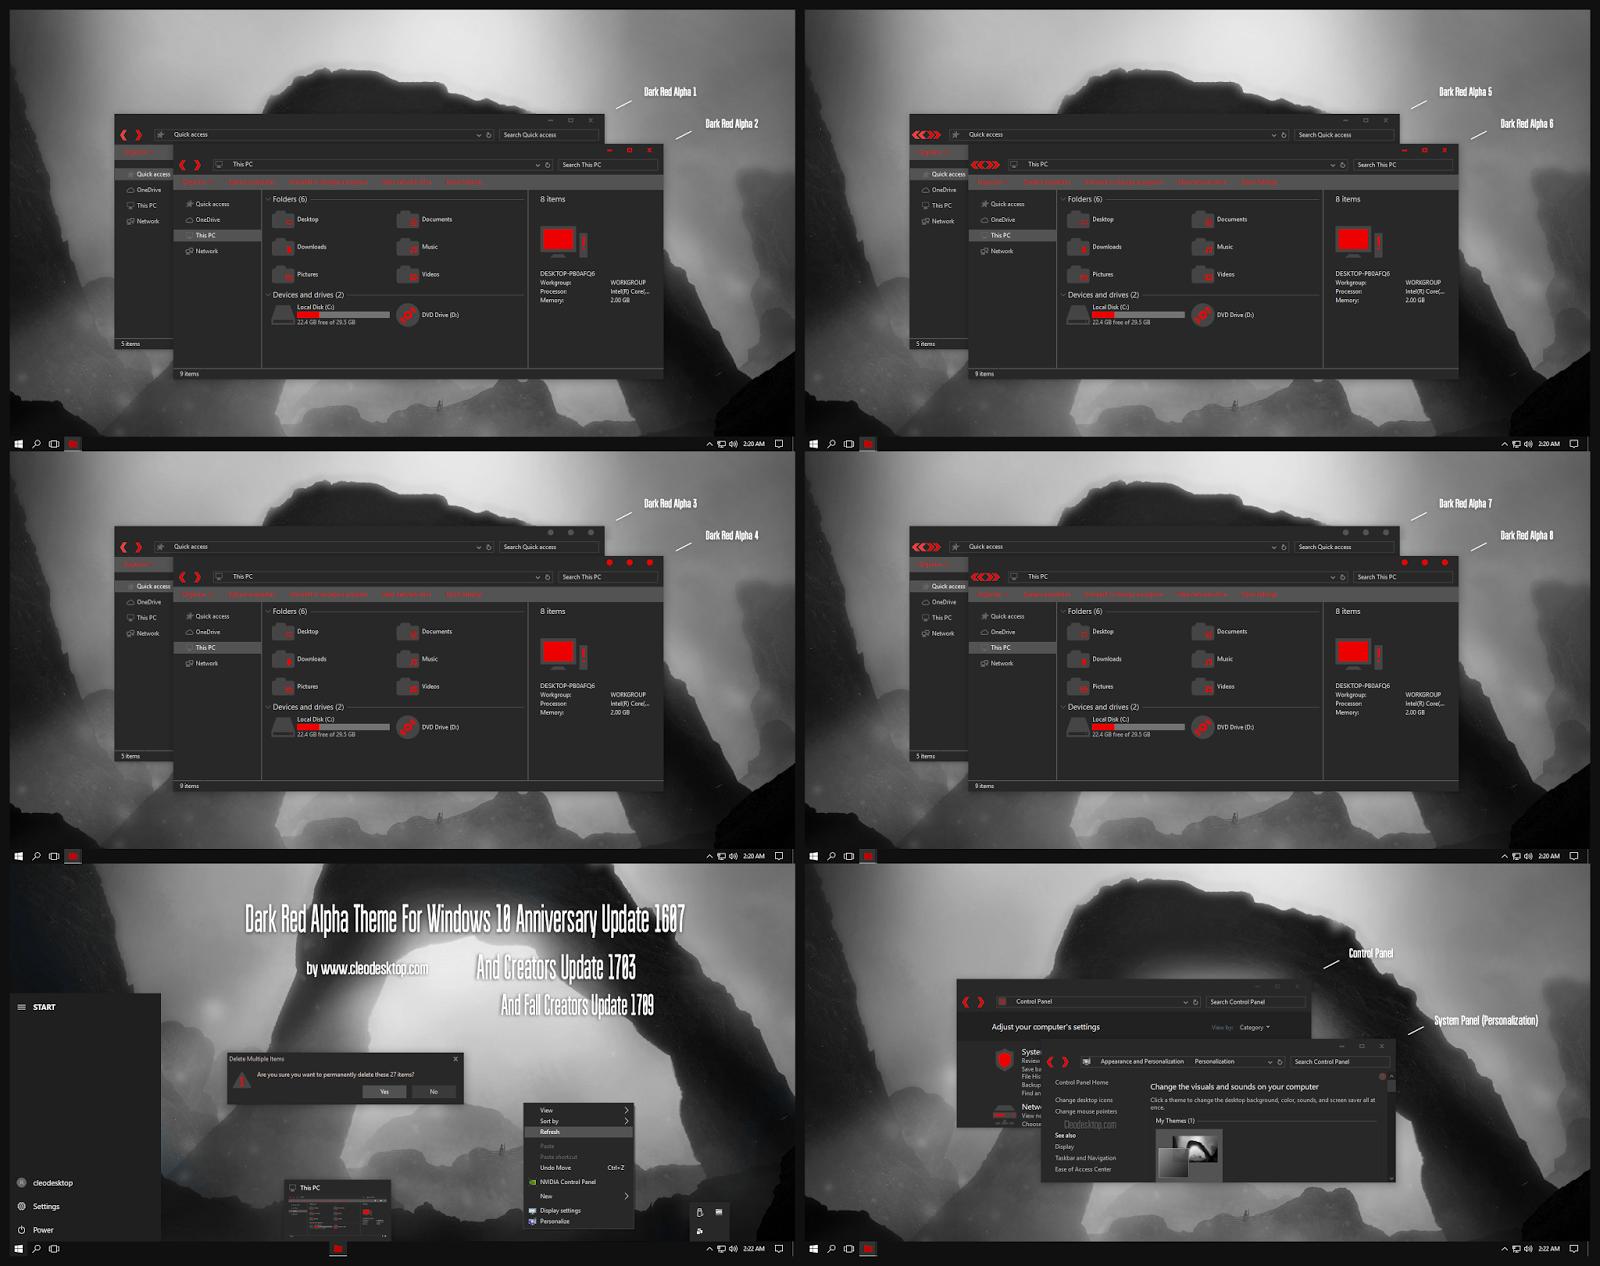 Dark Red Alpha Theme Windows10 Fall Creators Update 1709